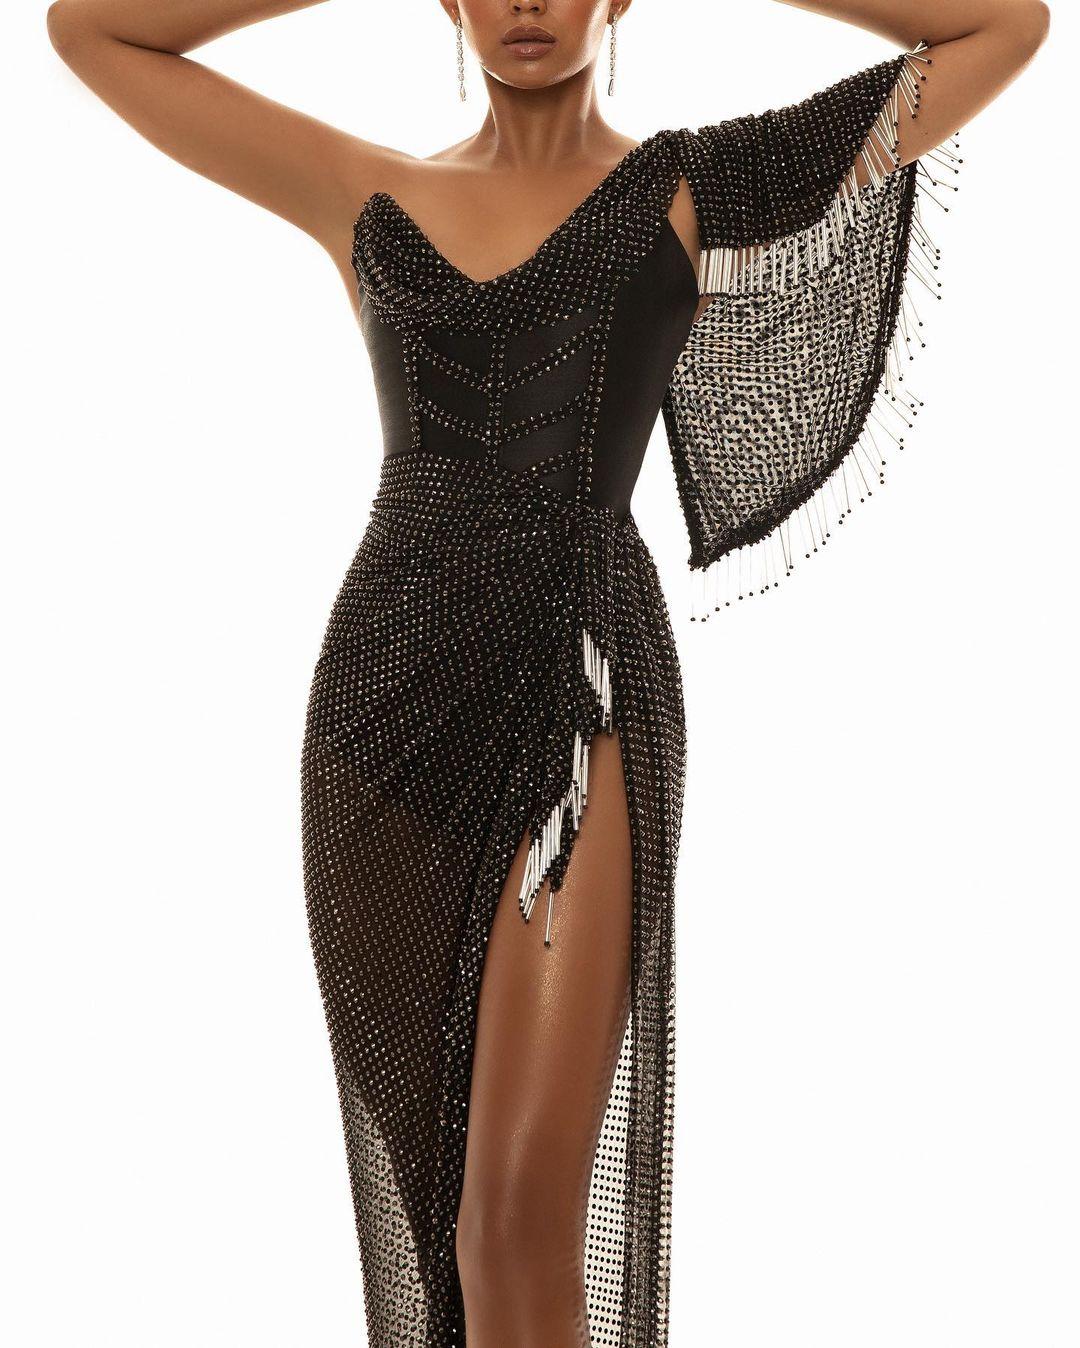 miss-universe-2021-katrina-dimaranan-evening-gown-photo